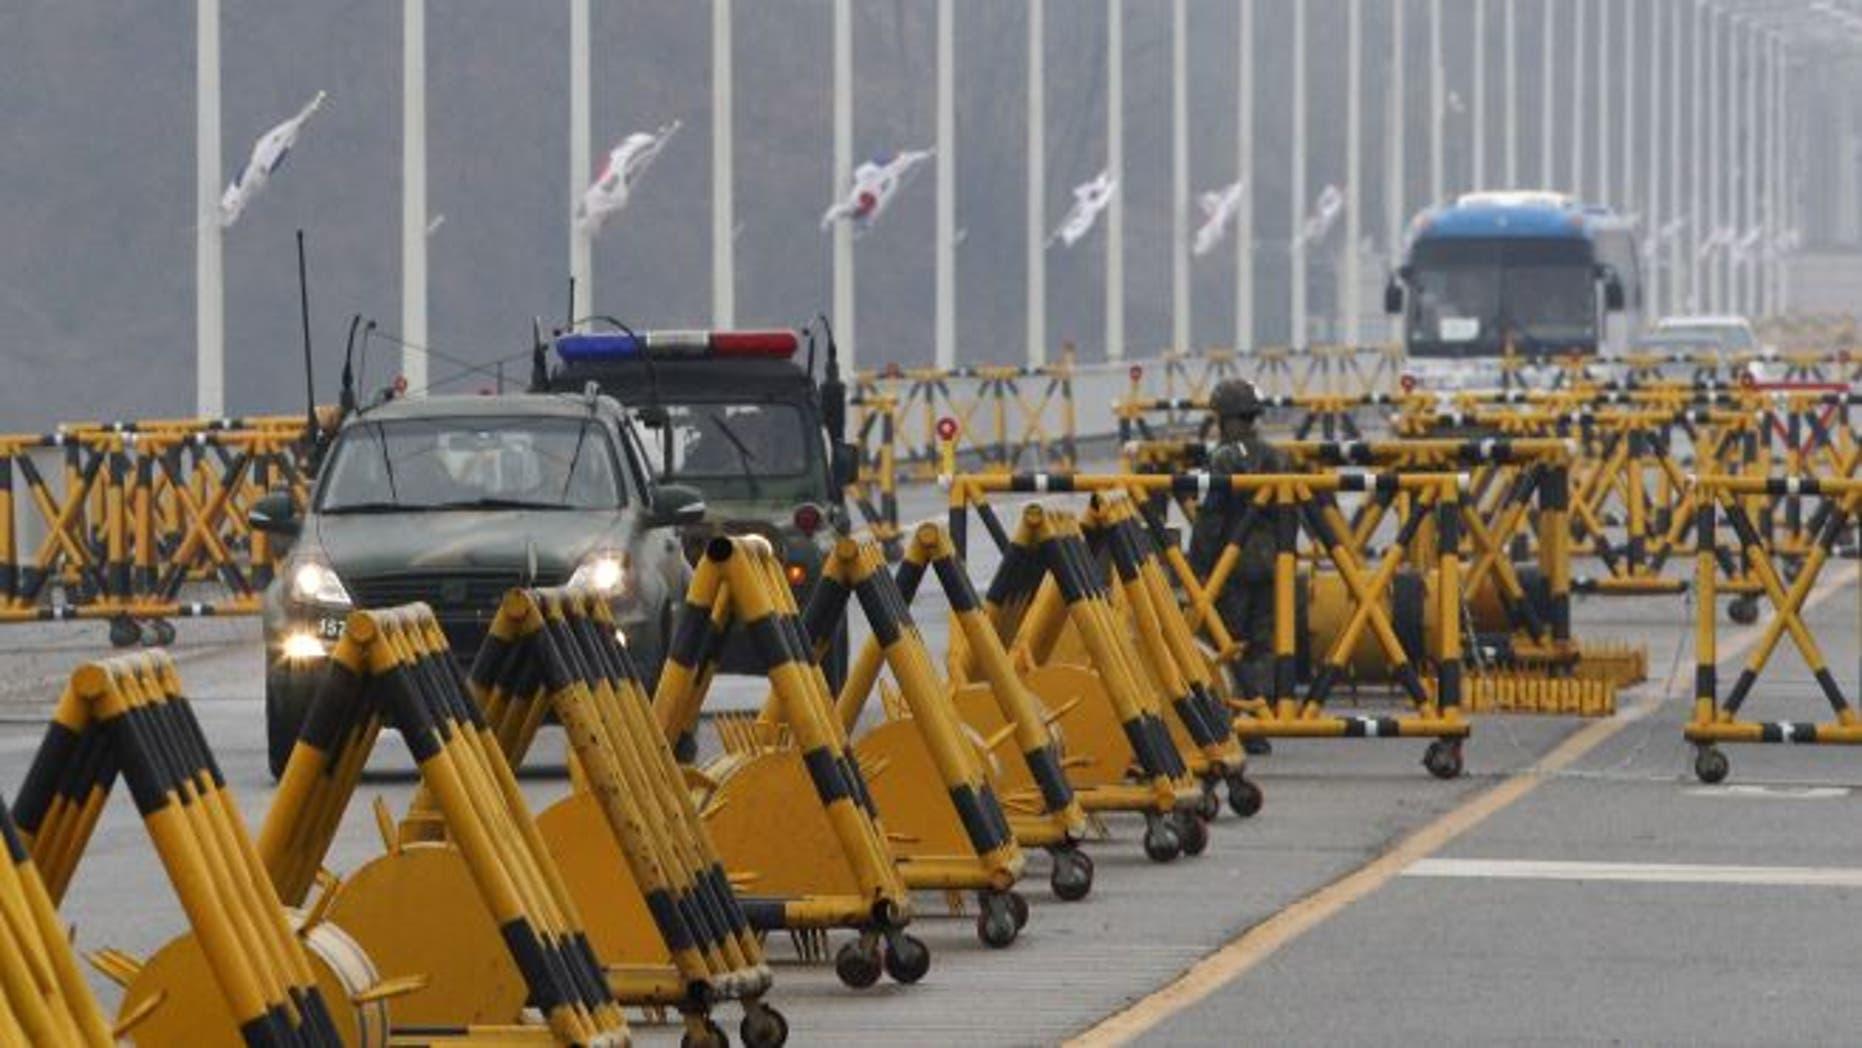 April 6, 2013: South Korean army vehicles cross Unification Bridge in Paju, South Korea, near the border village of Panmunjom.